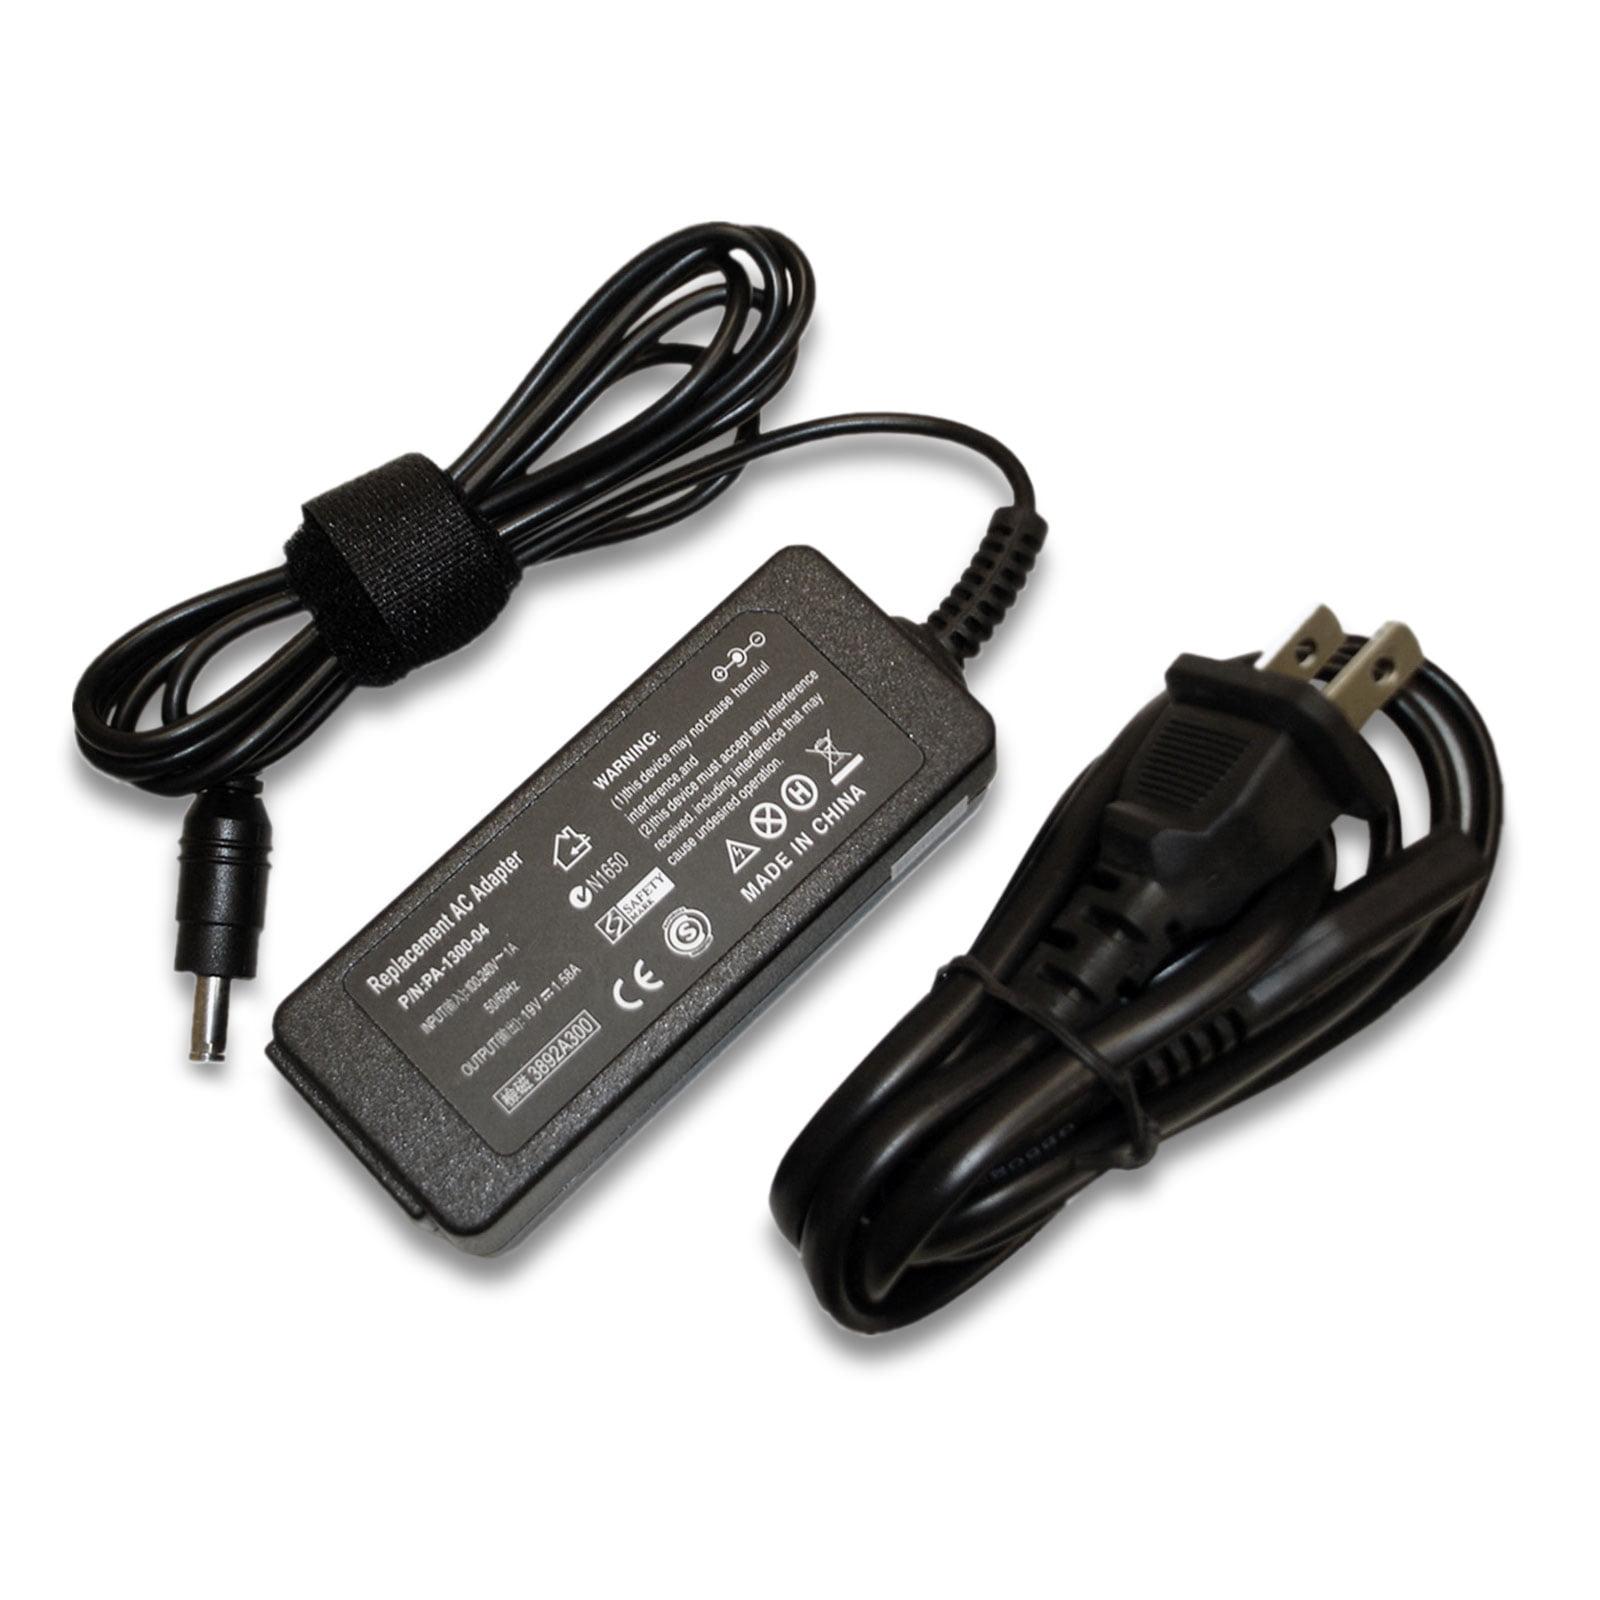 AC Power Supply Cord for Acer Aspire One 751h AO751h AOD150 D150-1577 ZA3 ZG-5